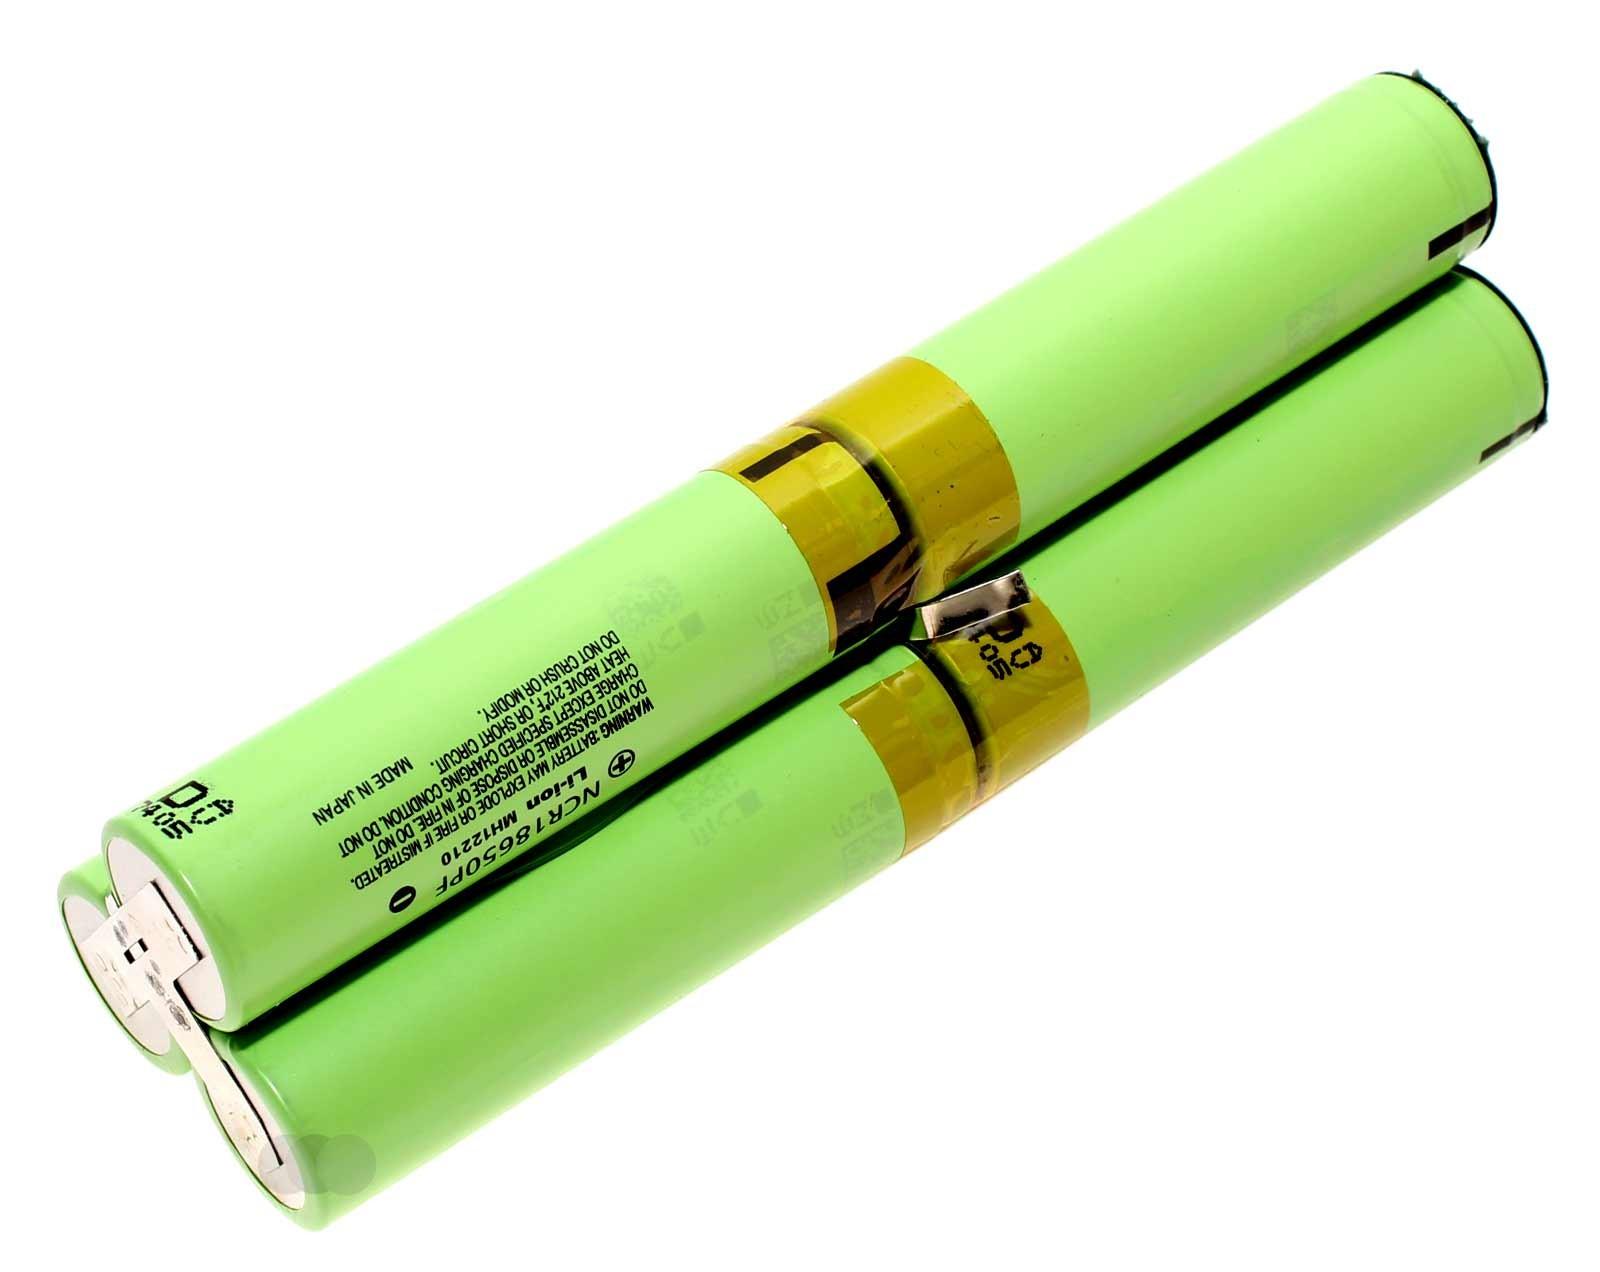 Akkupack bzw. neue Akku-Zellen für Olight SR 90 Intimidator LED Taschenlampe, 21,6V, 2900mAh